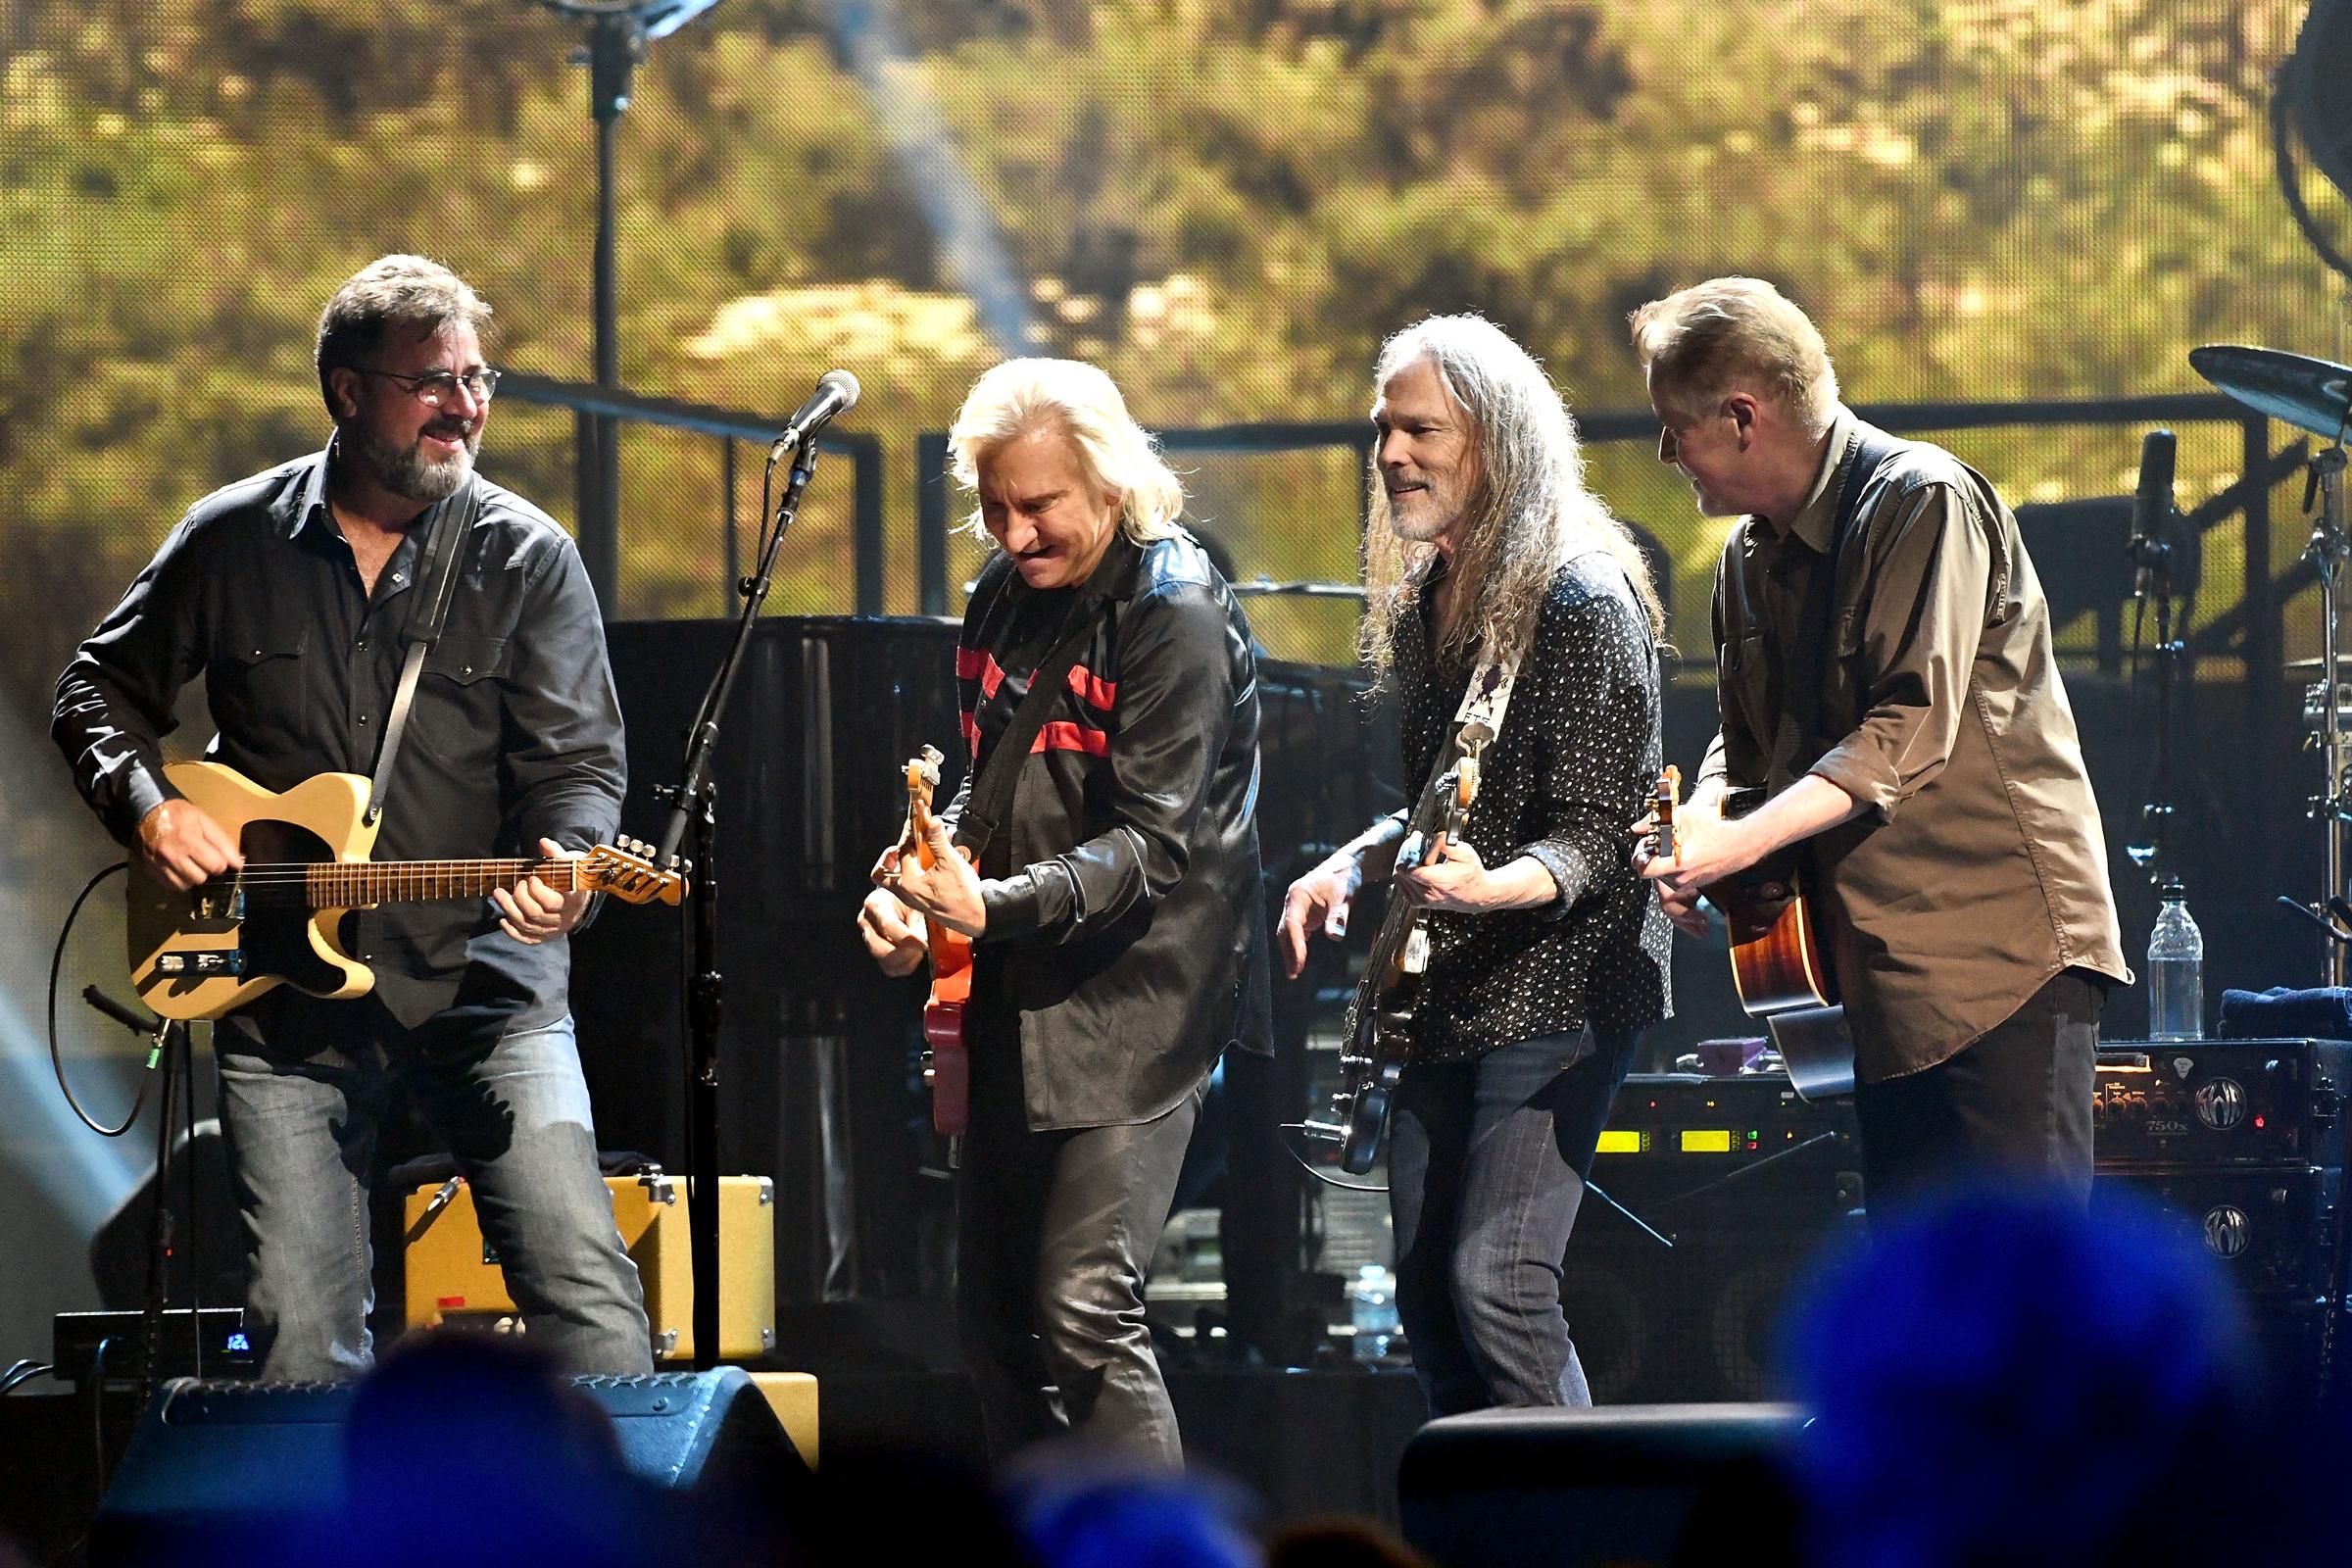 Eagles Plot Special 'Hotel California' Shows in Las Vegas